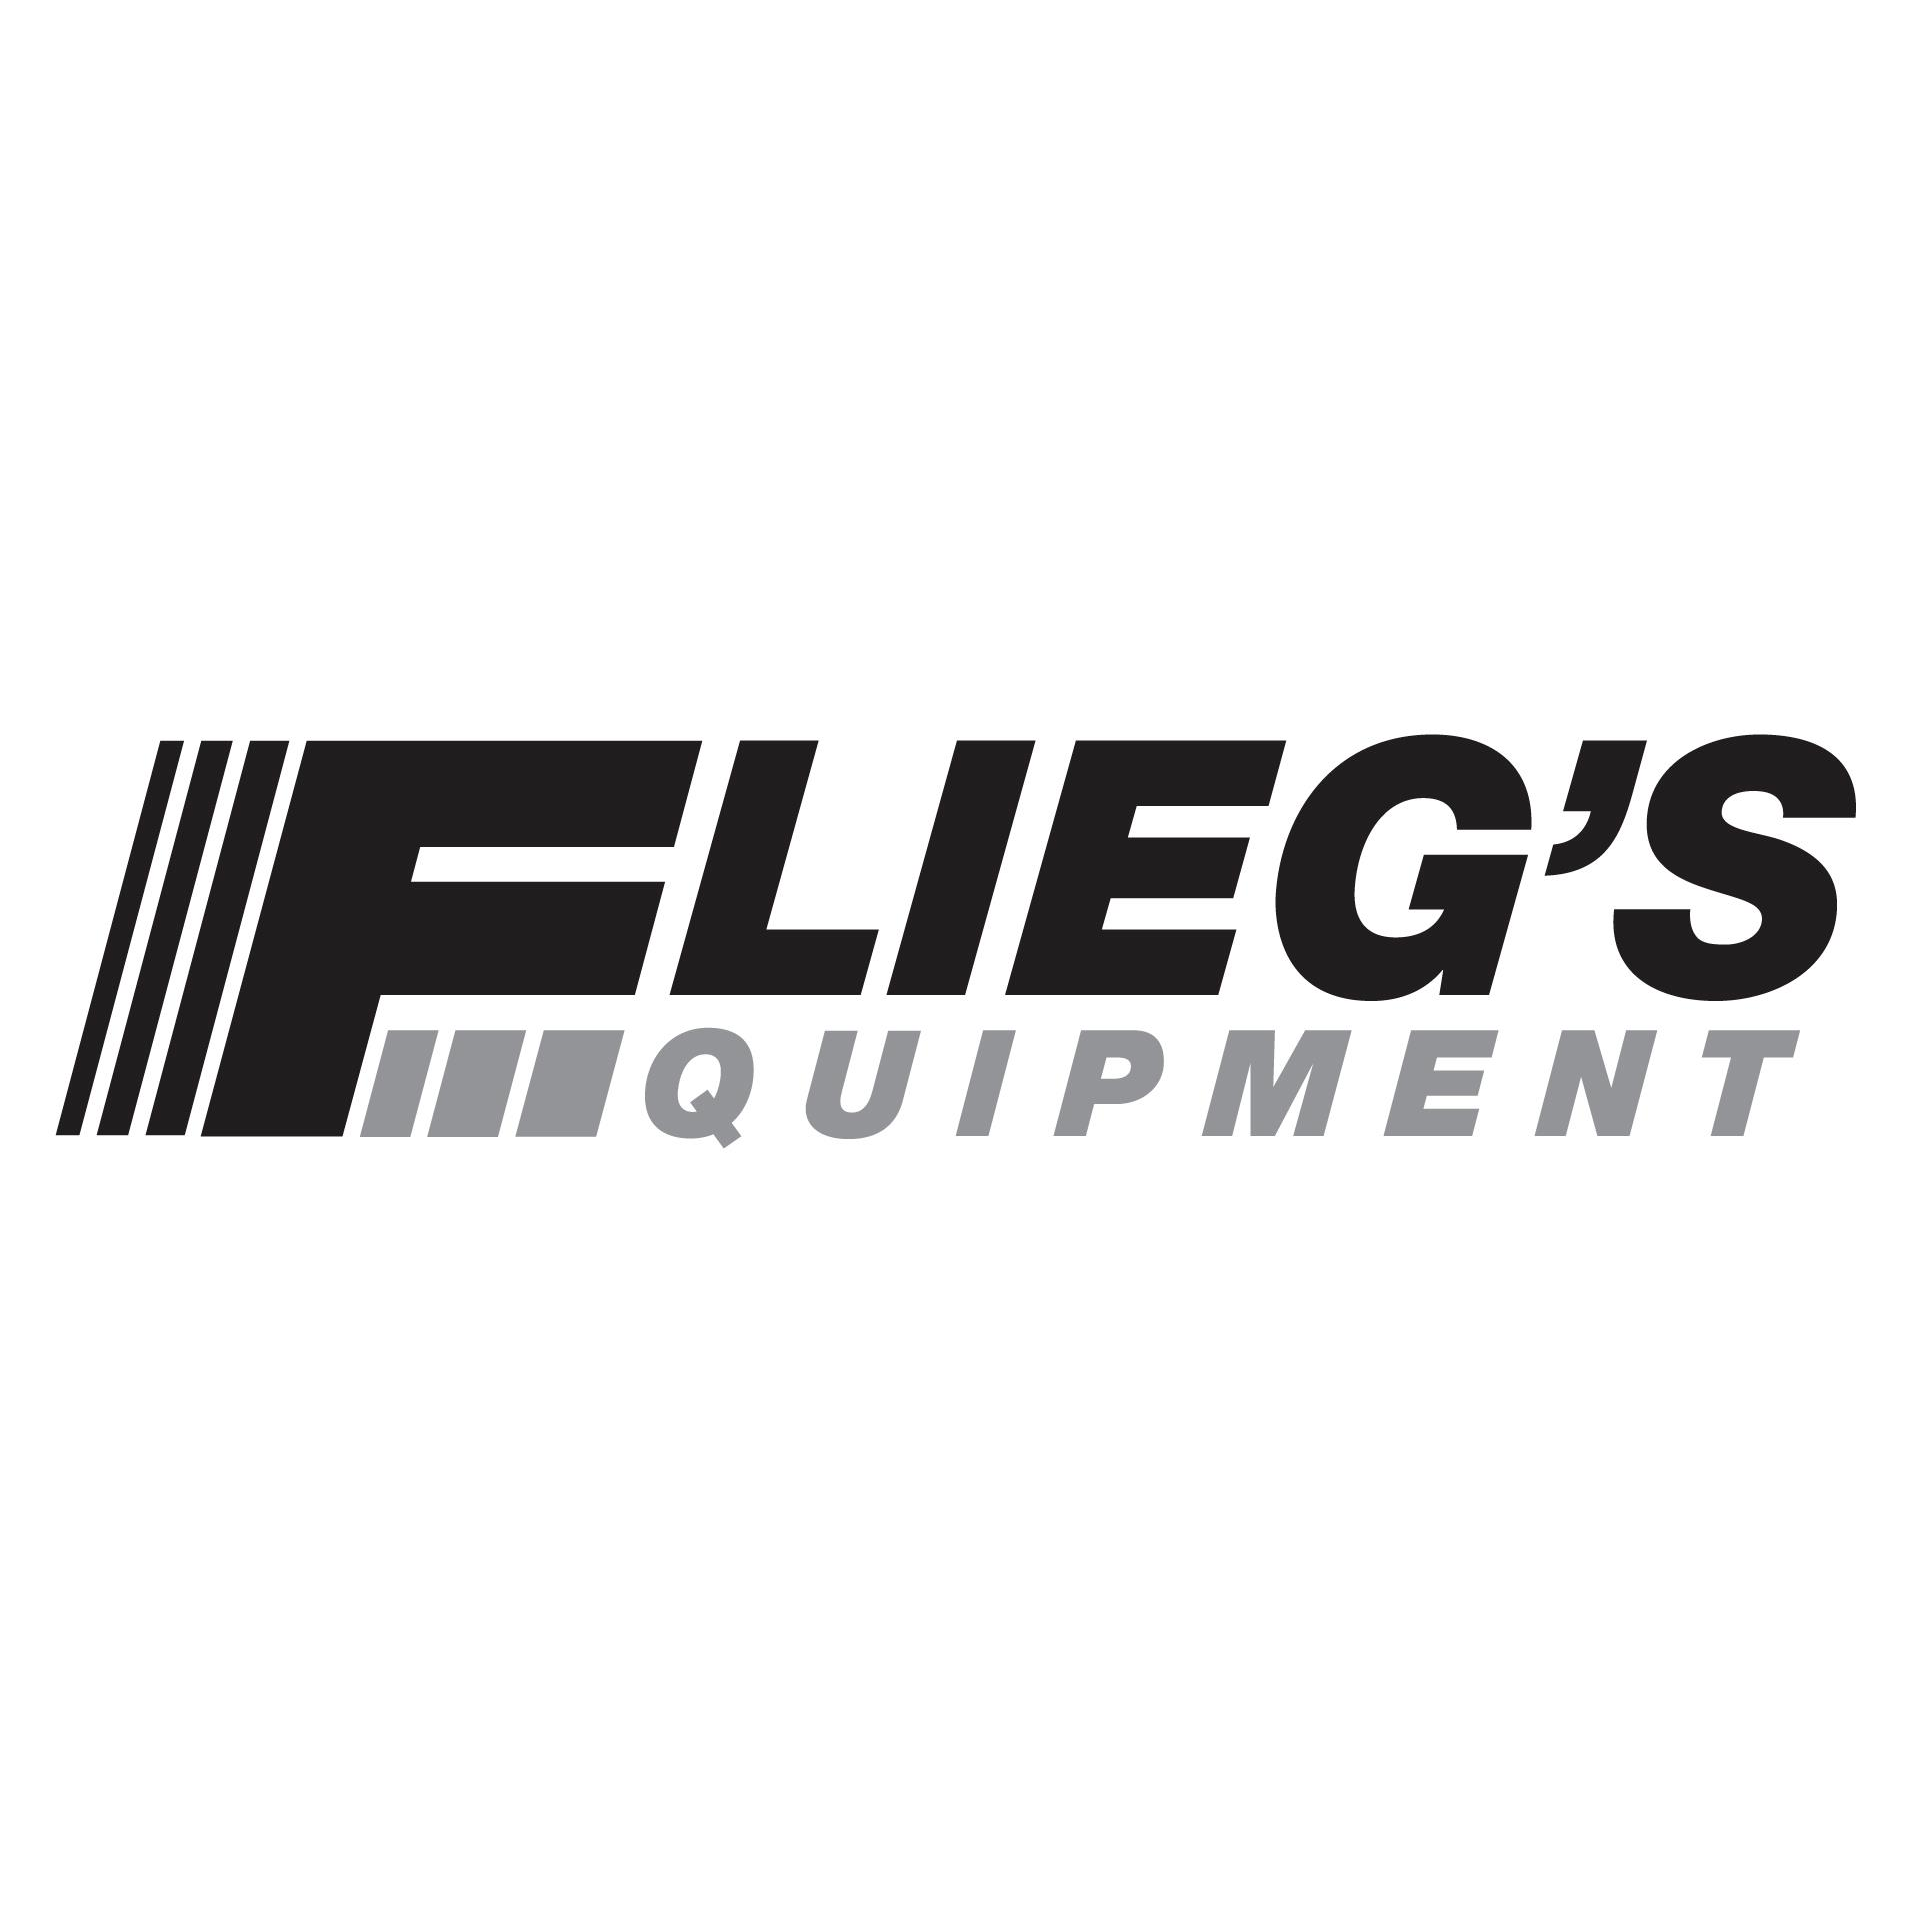 Flieg's Equipment image 4